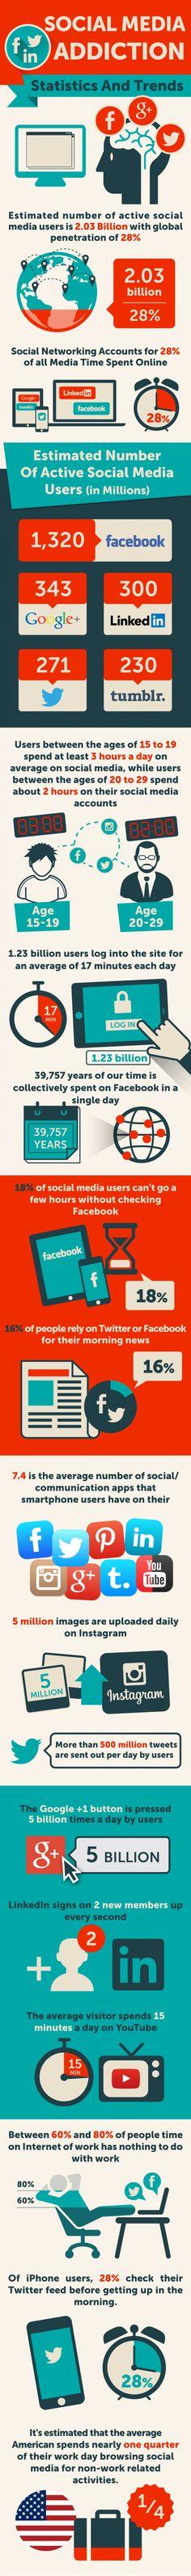 #SocialMedia #Addiction  Infographic